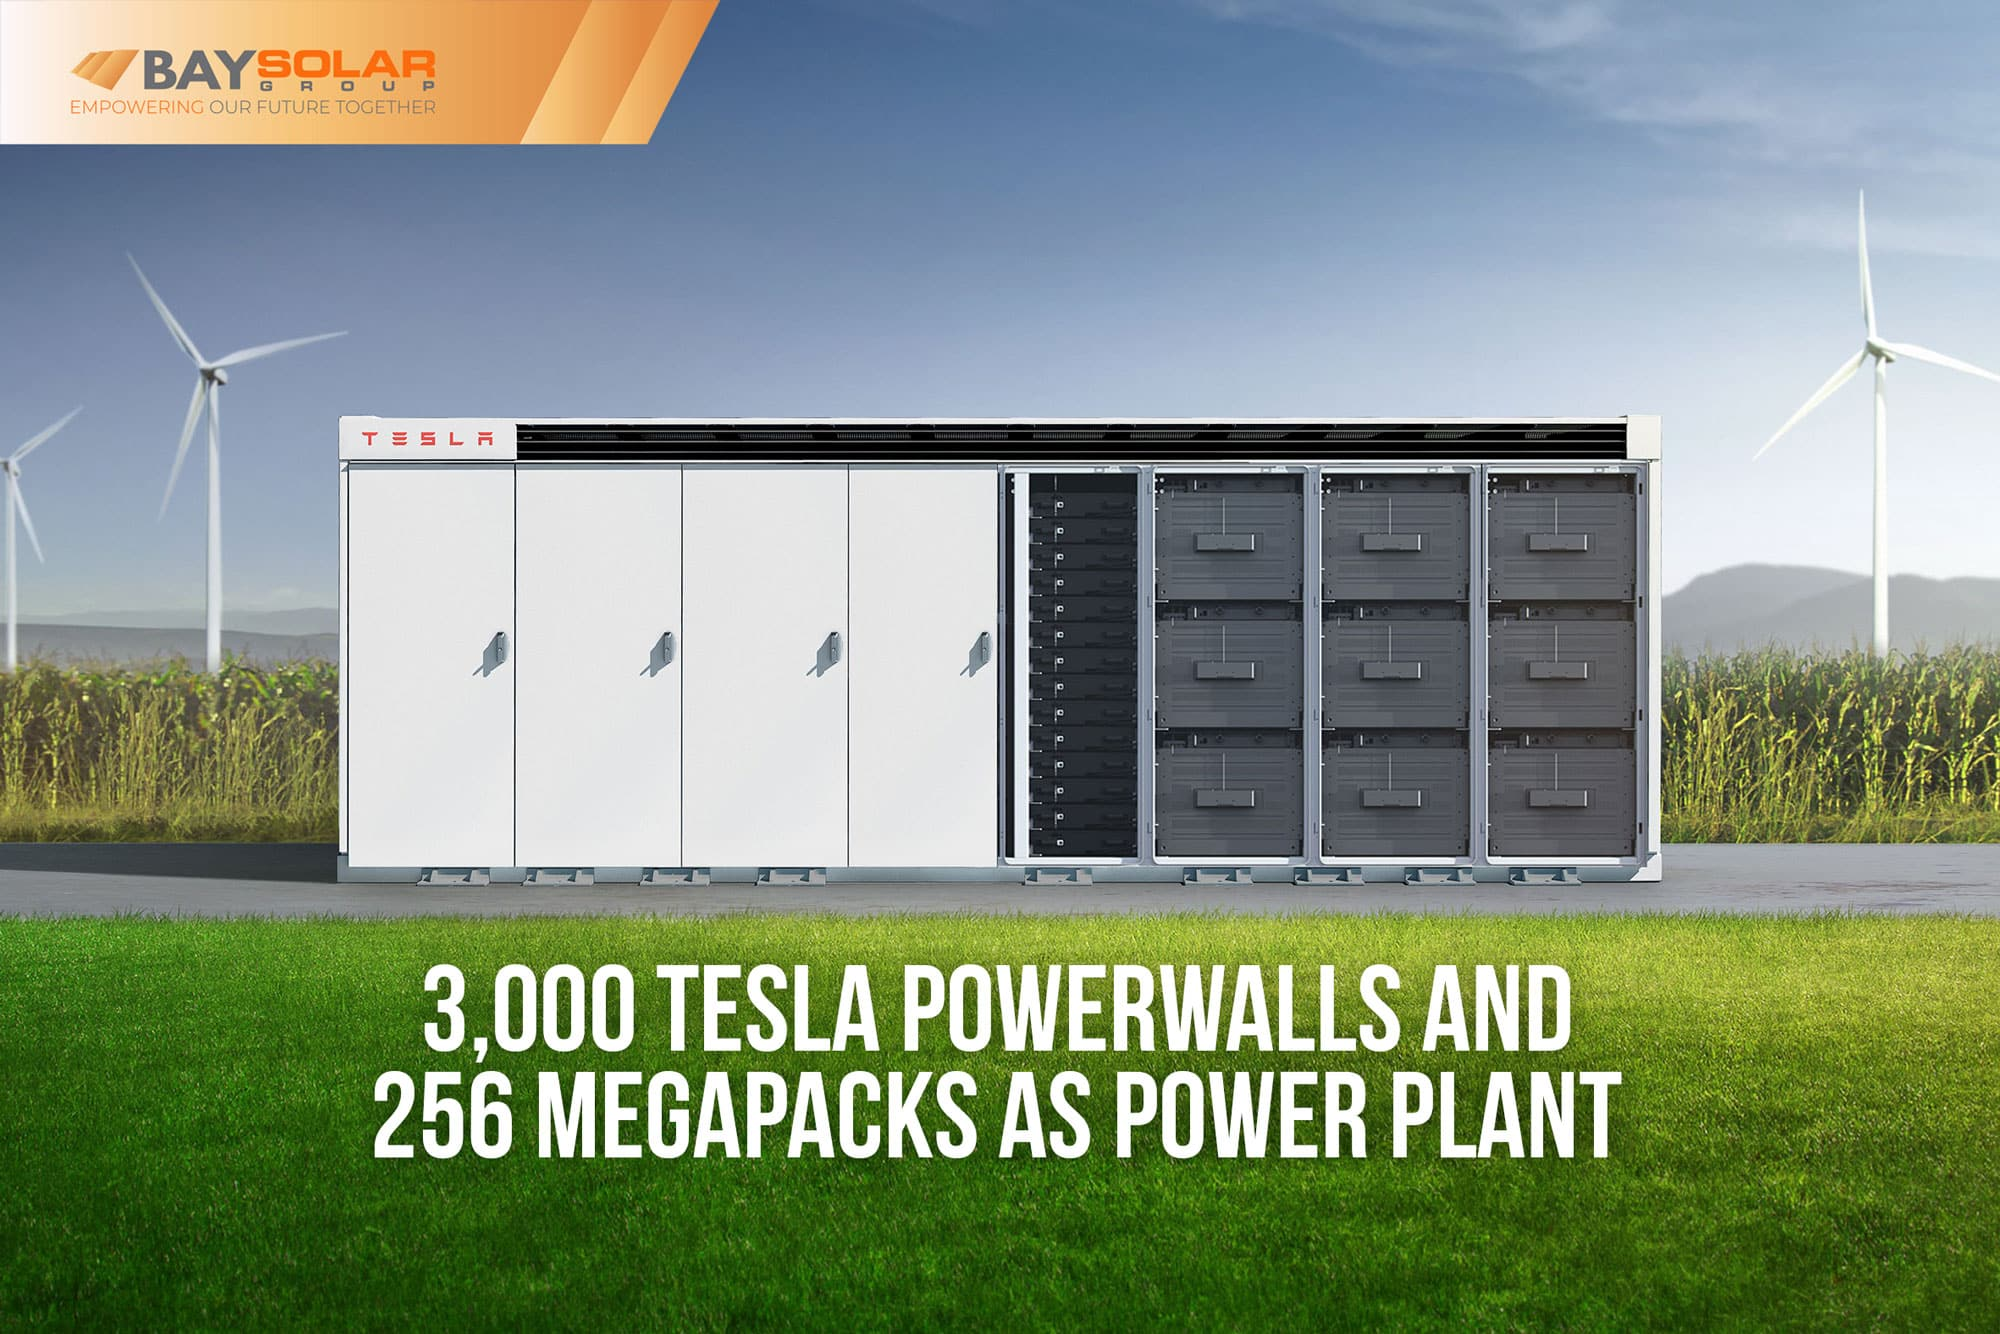 Tesla-Powerwall-On-The-Grass